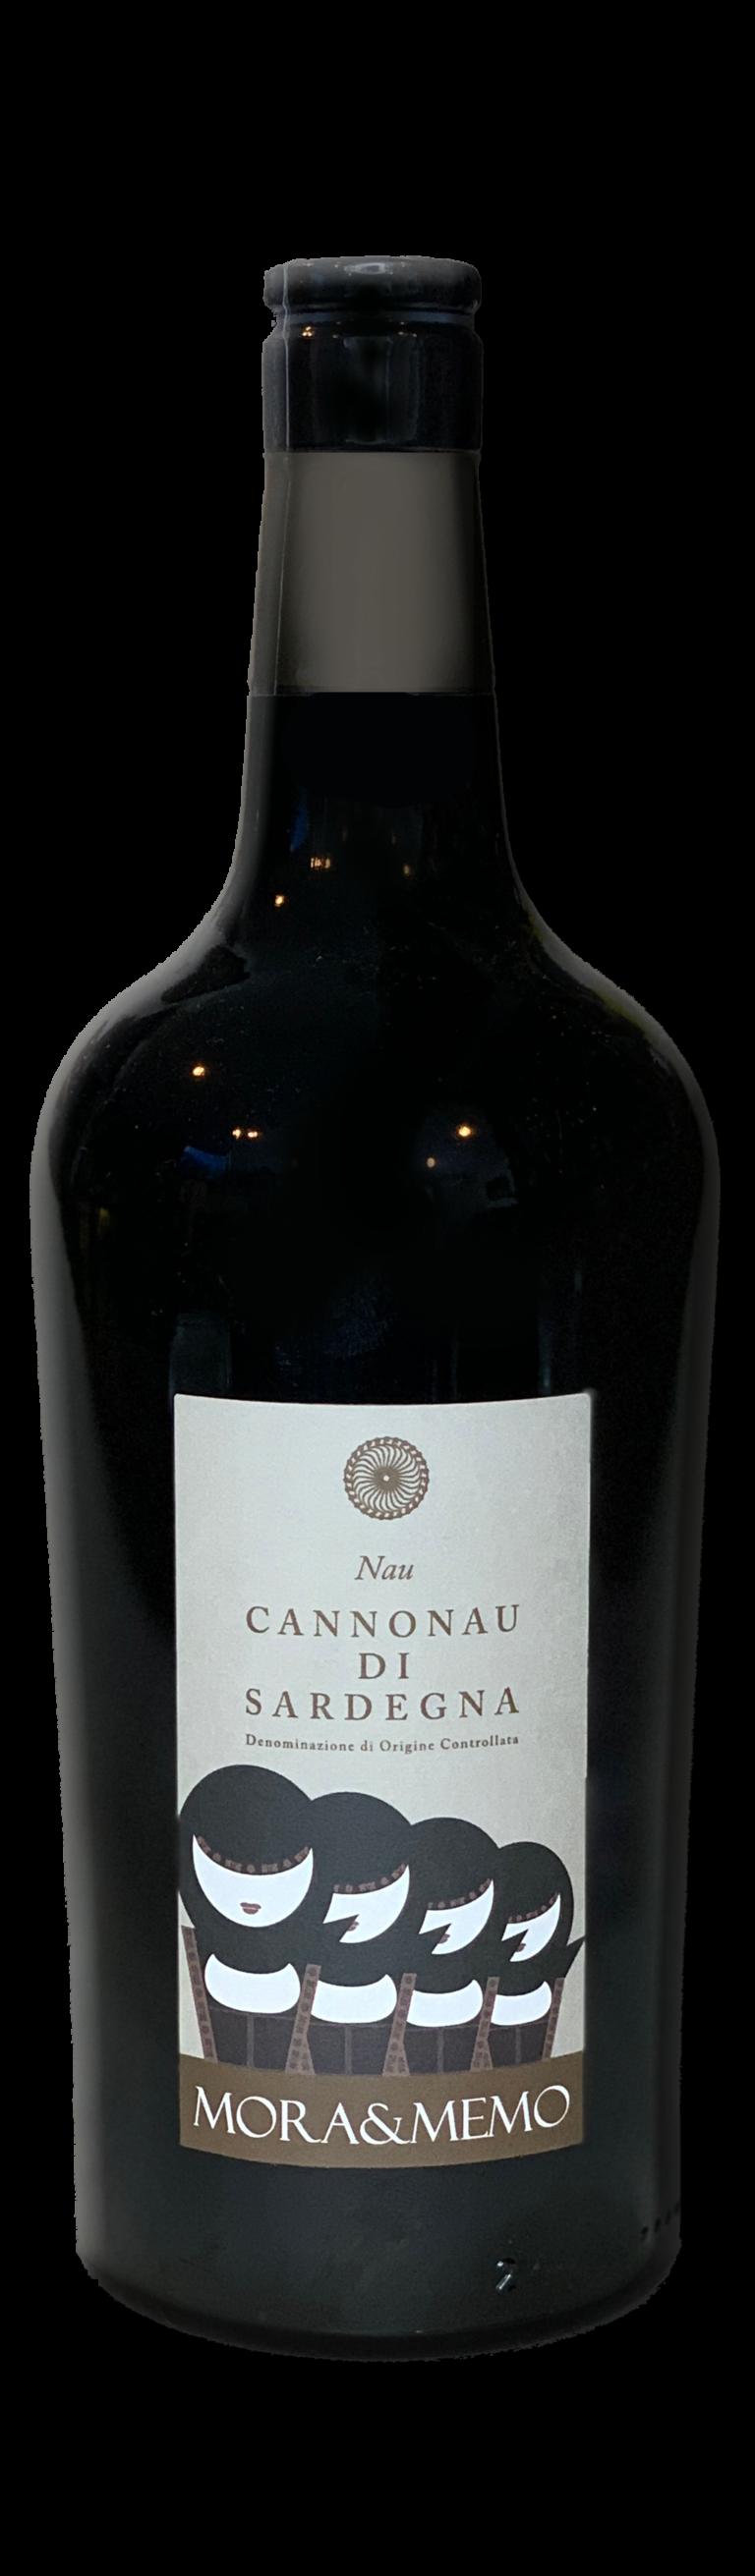 Cannonau-Nau